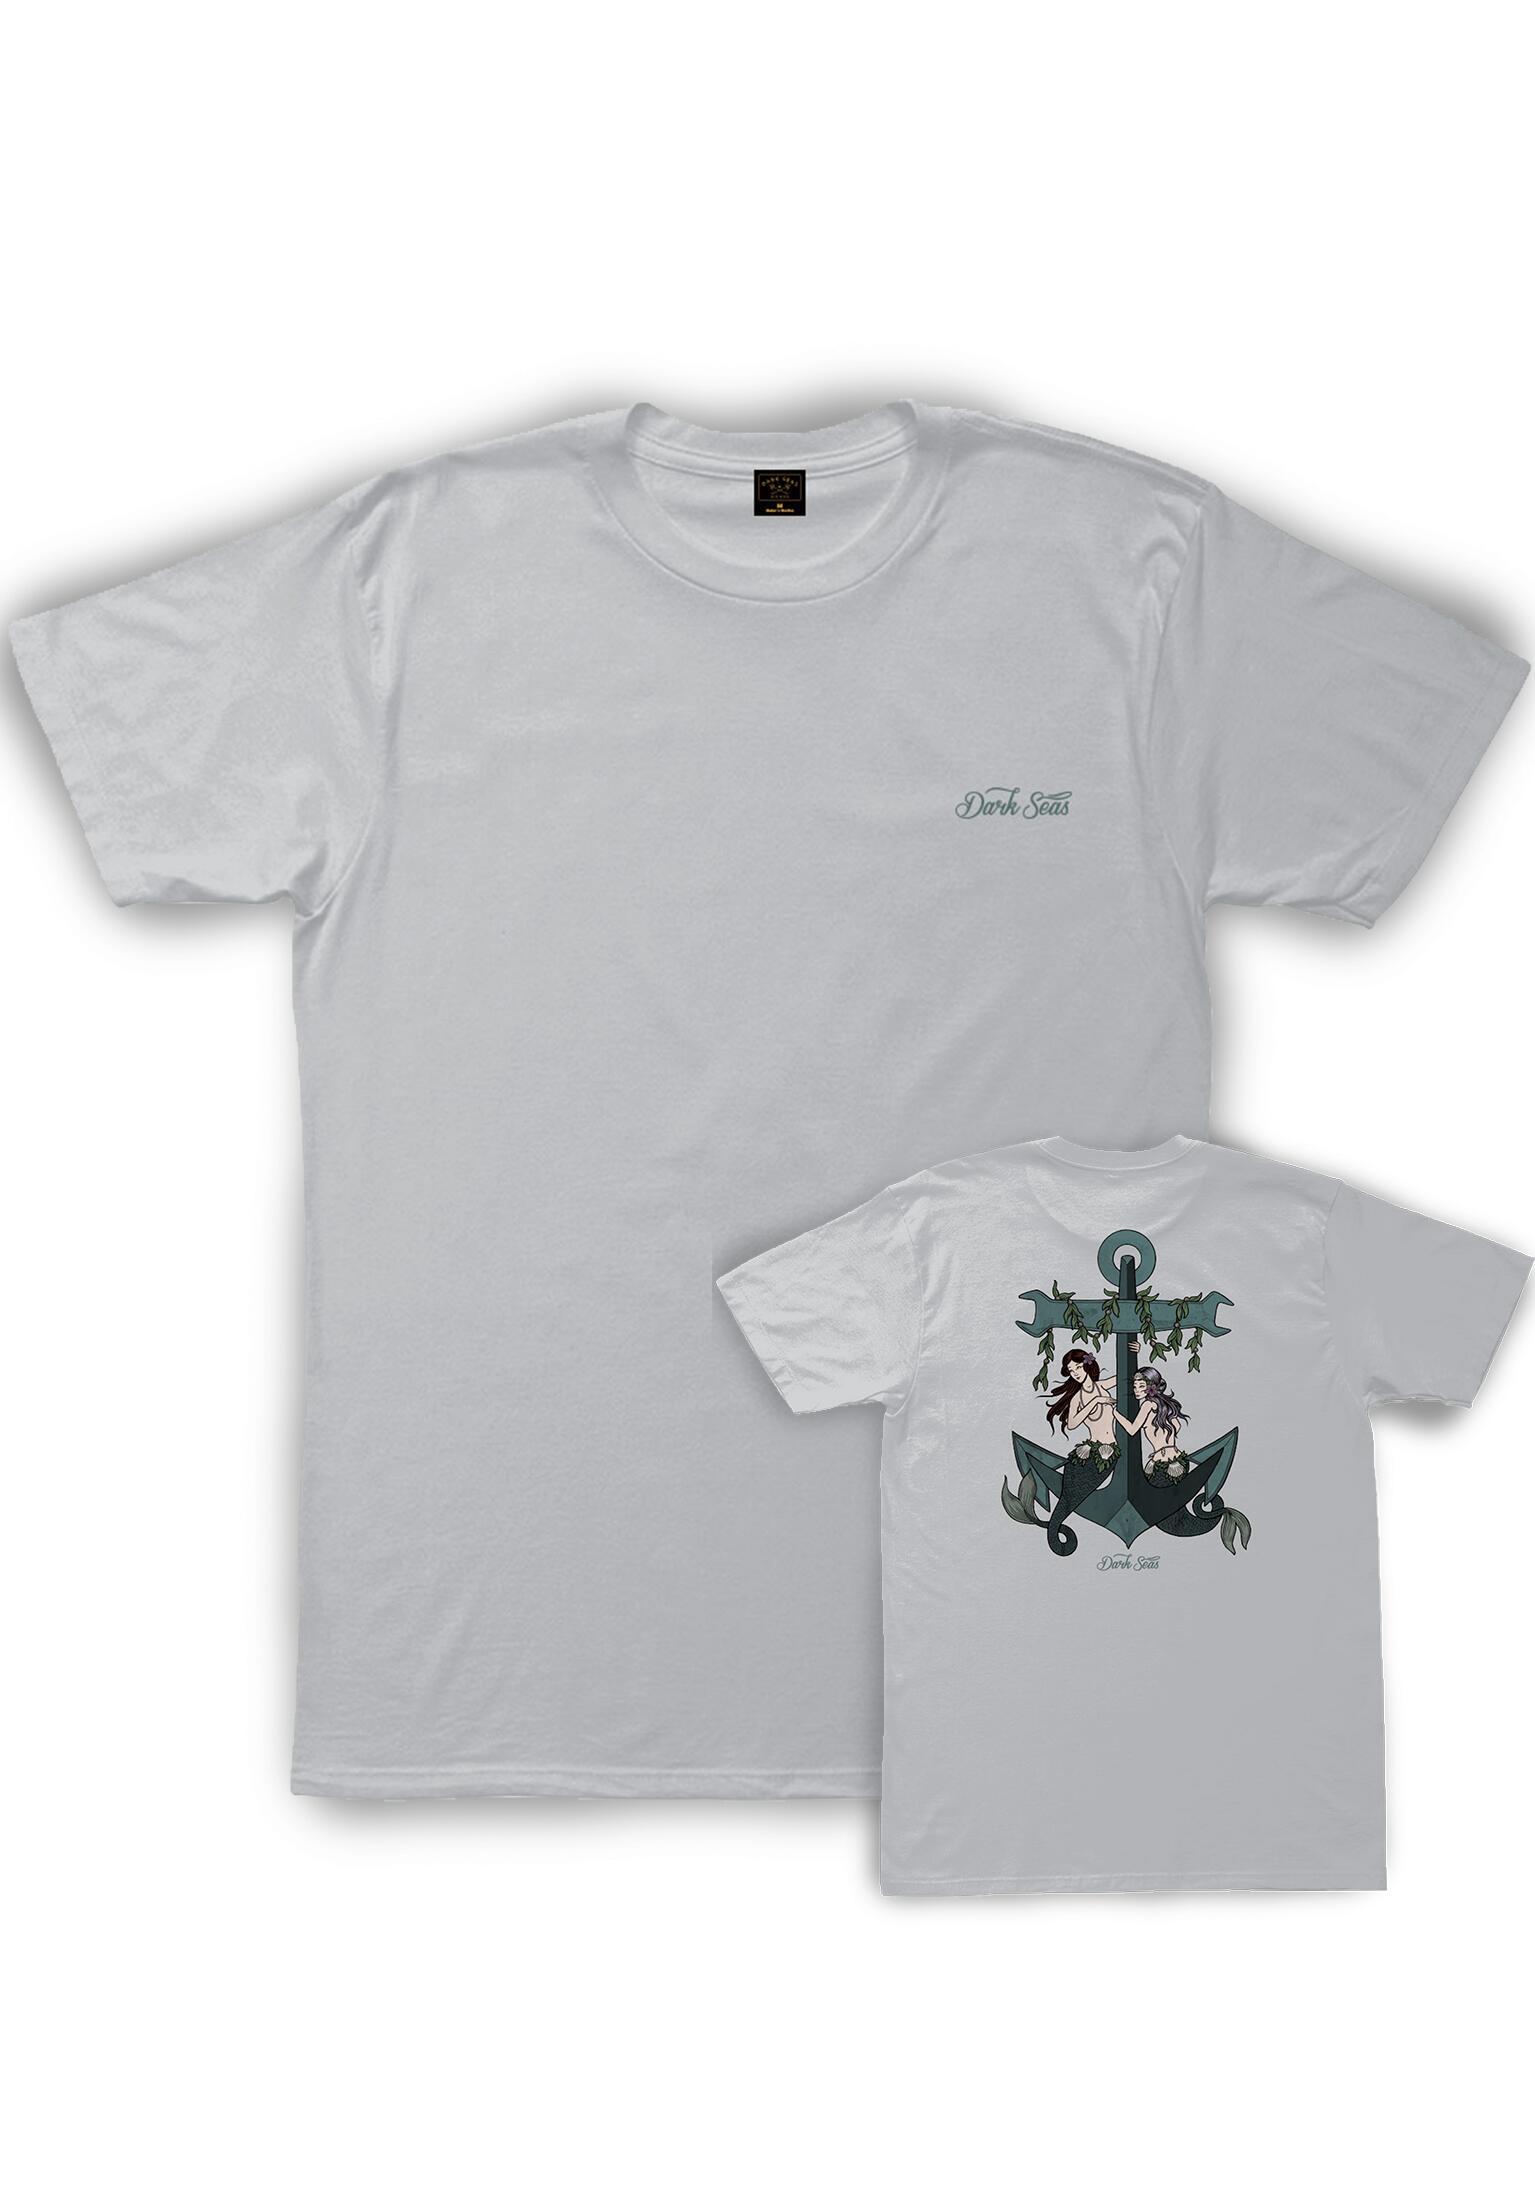 184444b2e463 Temptress Dark Seas T-Shirts in silver for Men | Titus